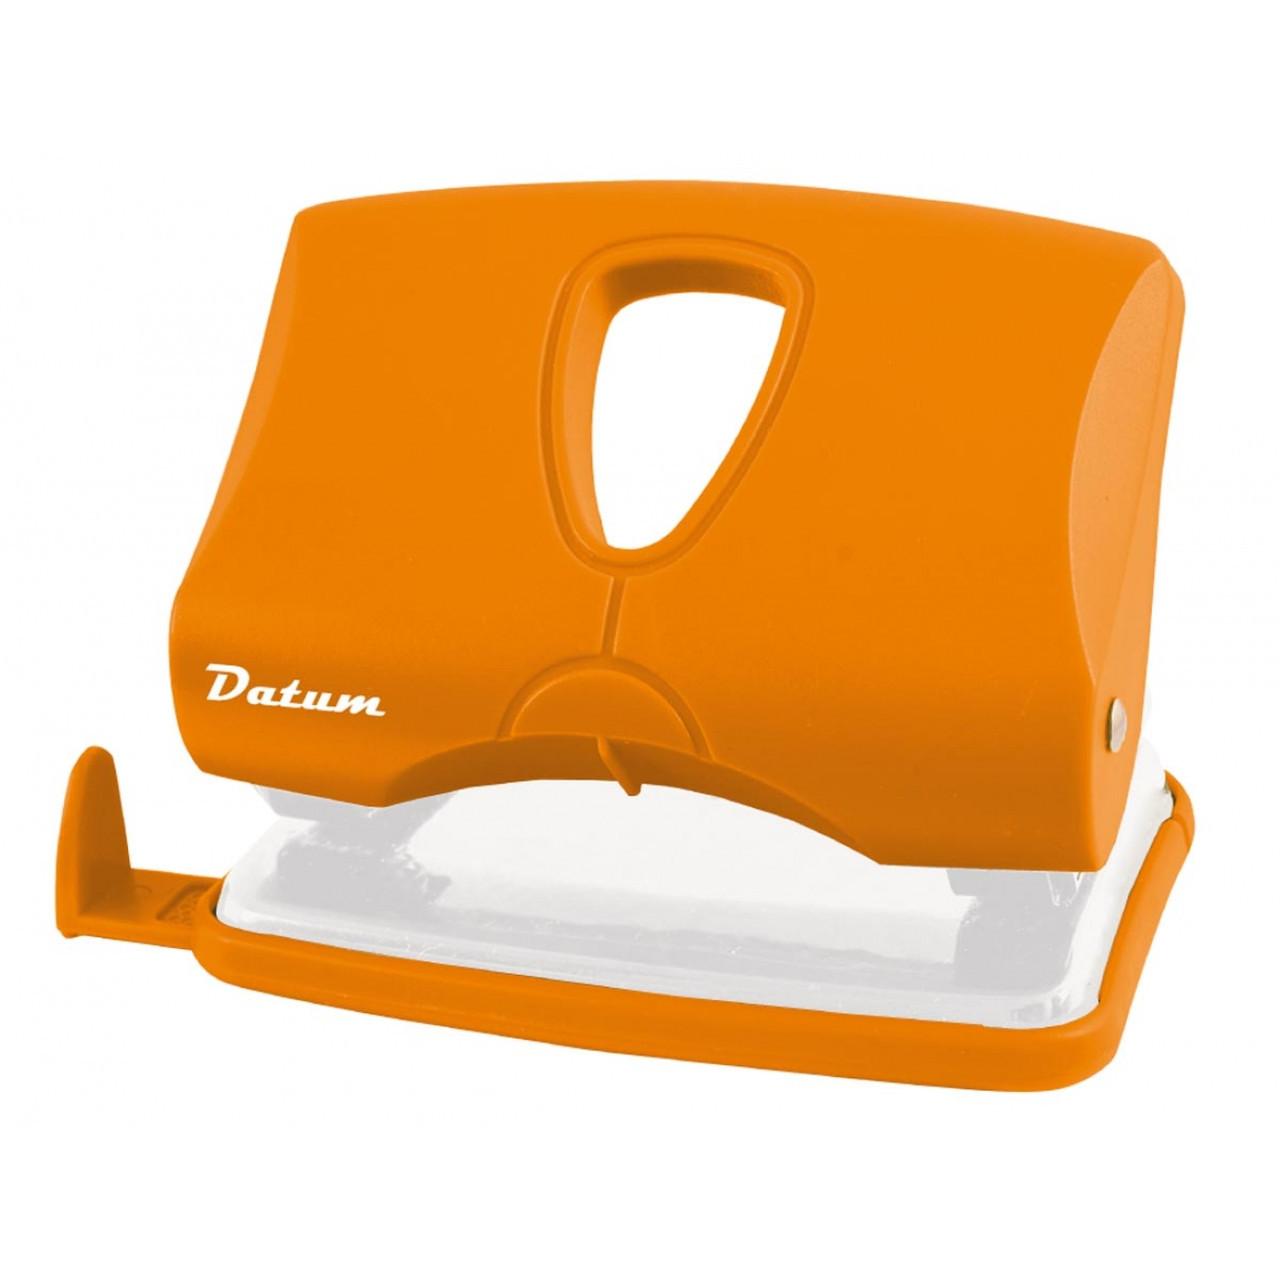 Дырокол 20л пласт. D1218-11 оранжевый